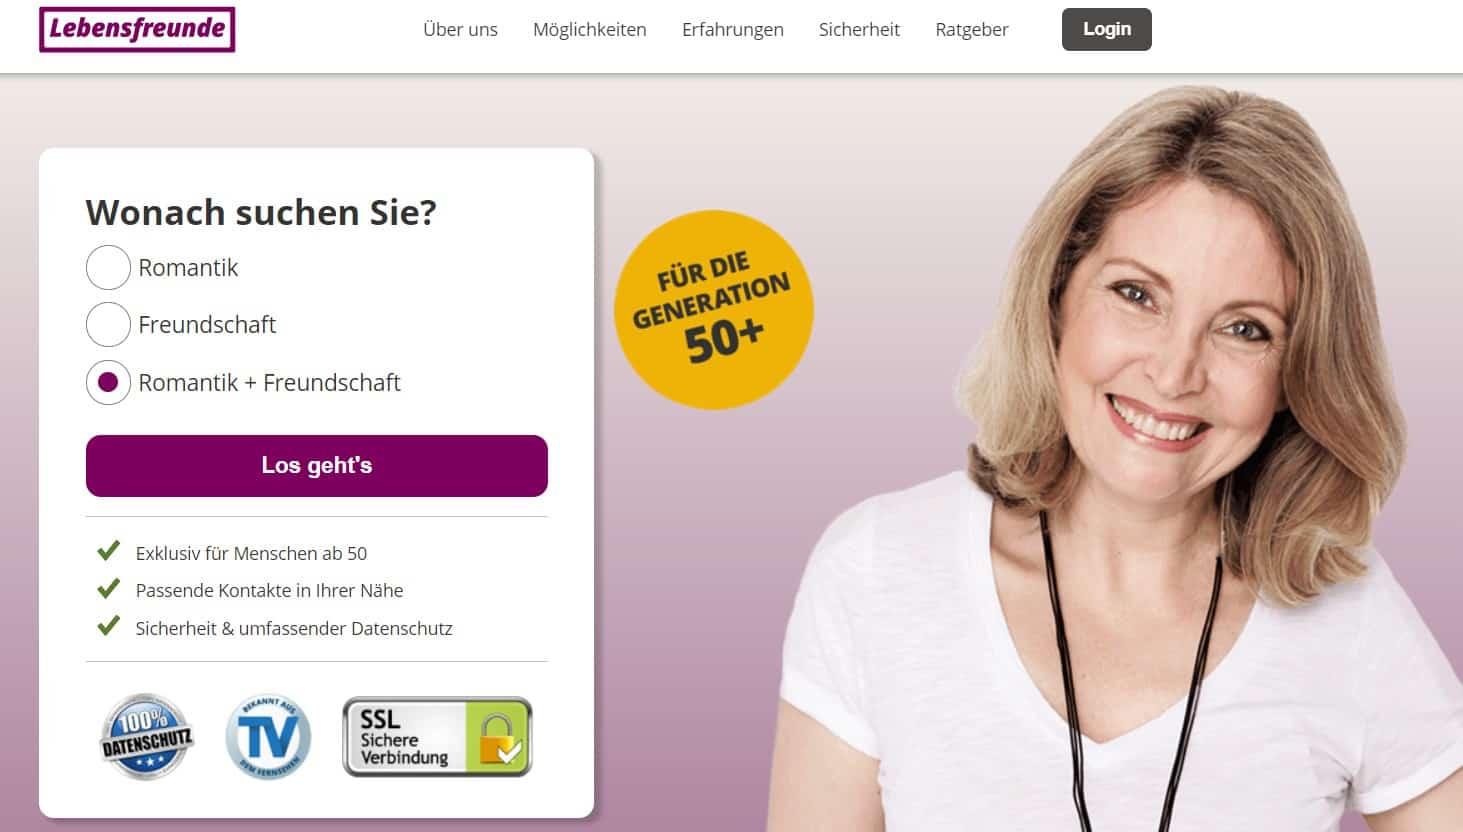 Testbericht: LebensFreunde.de Abzocke